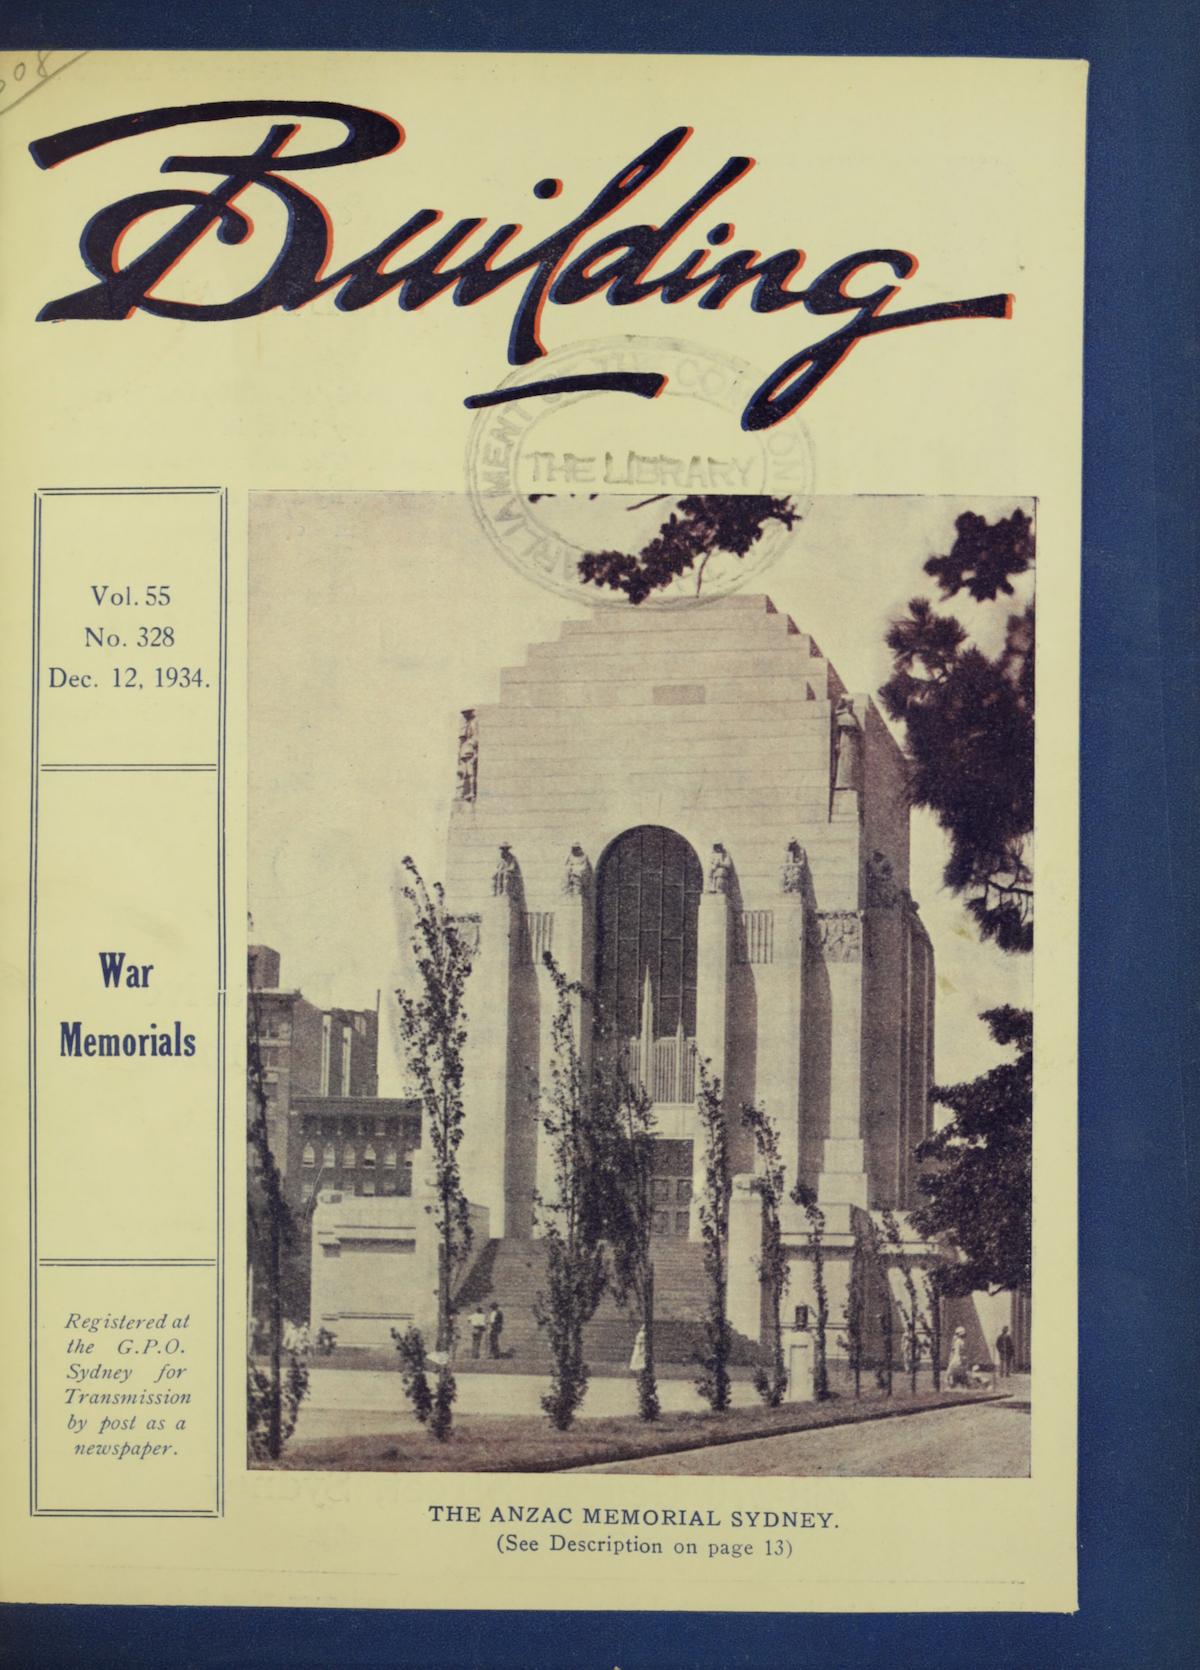 Image of Building magazine, Vol 5, No 398